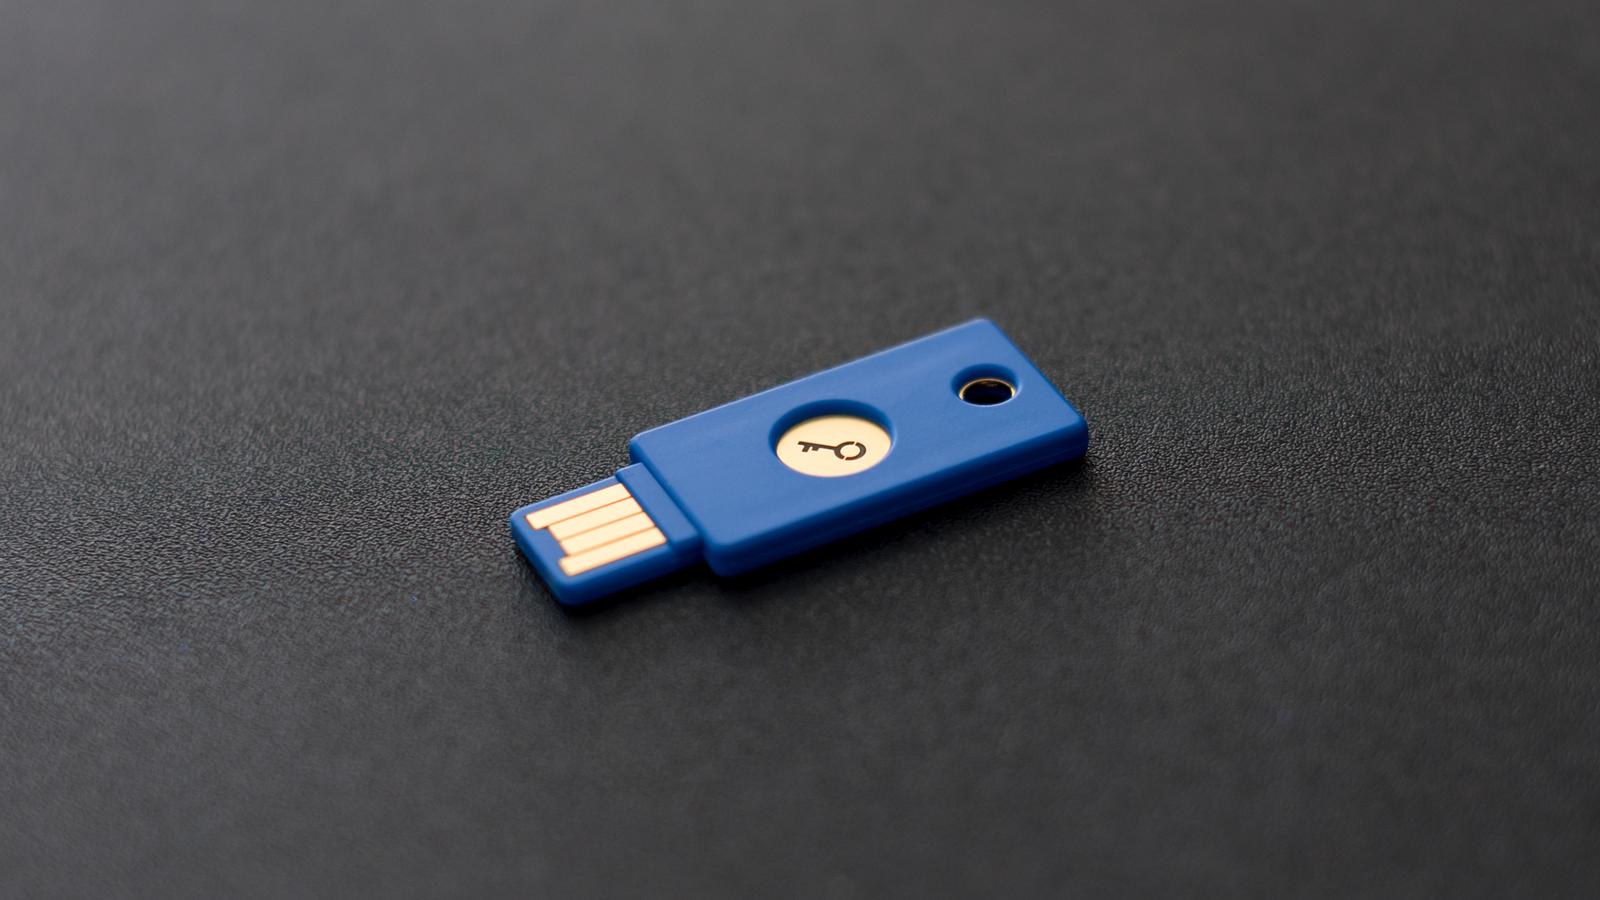 USB security key on dark background